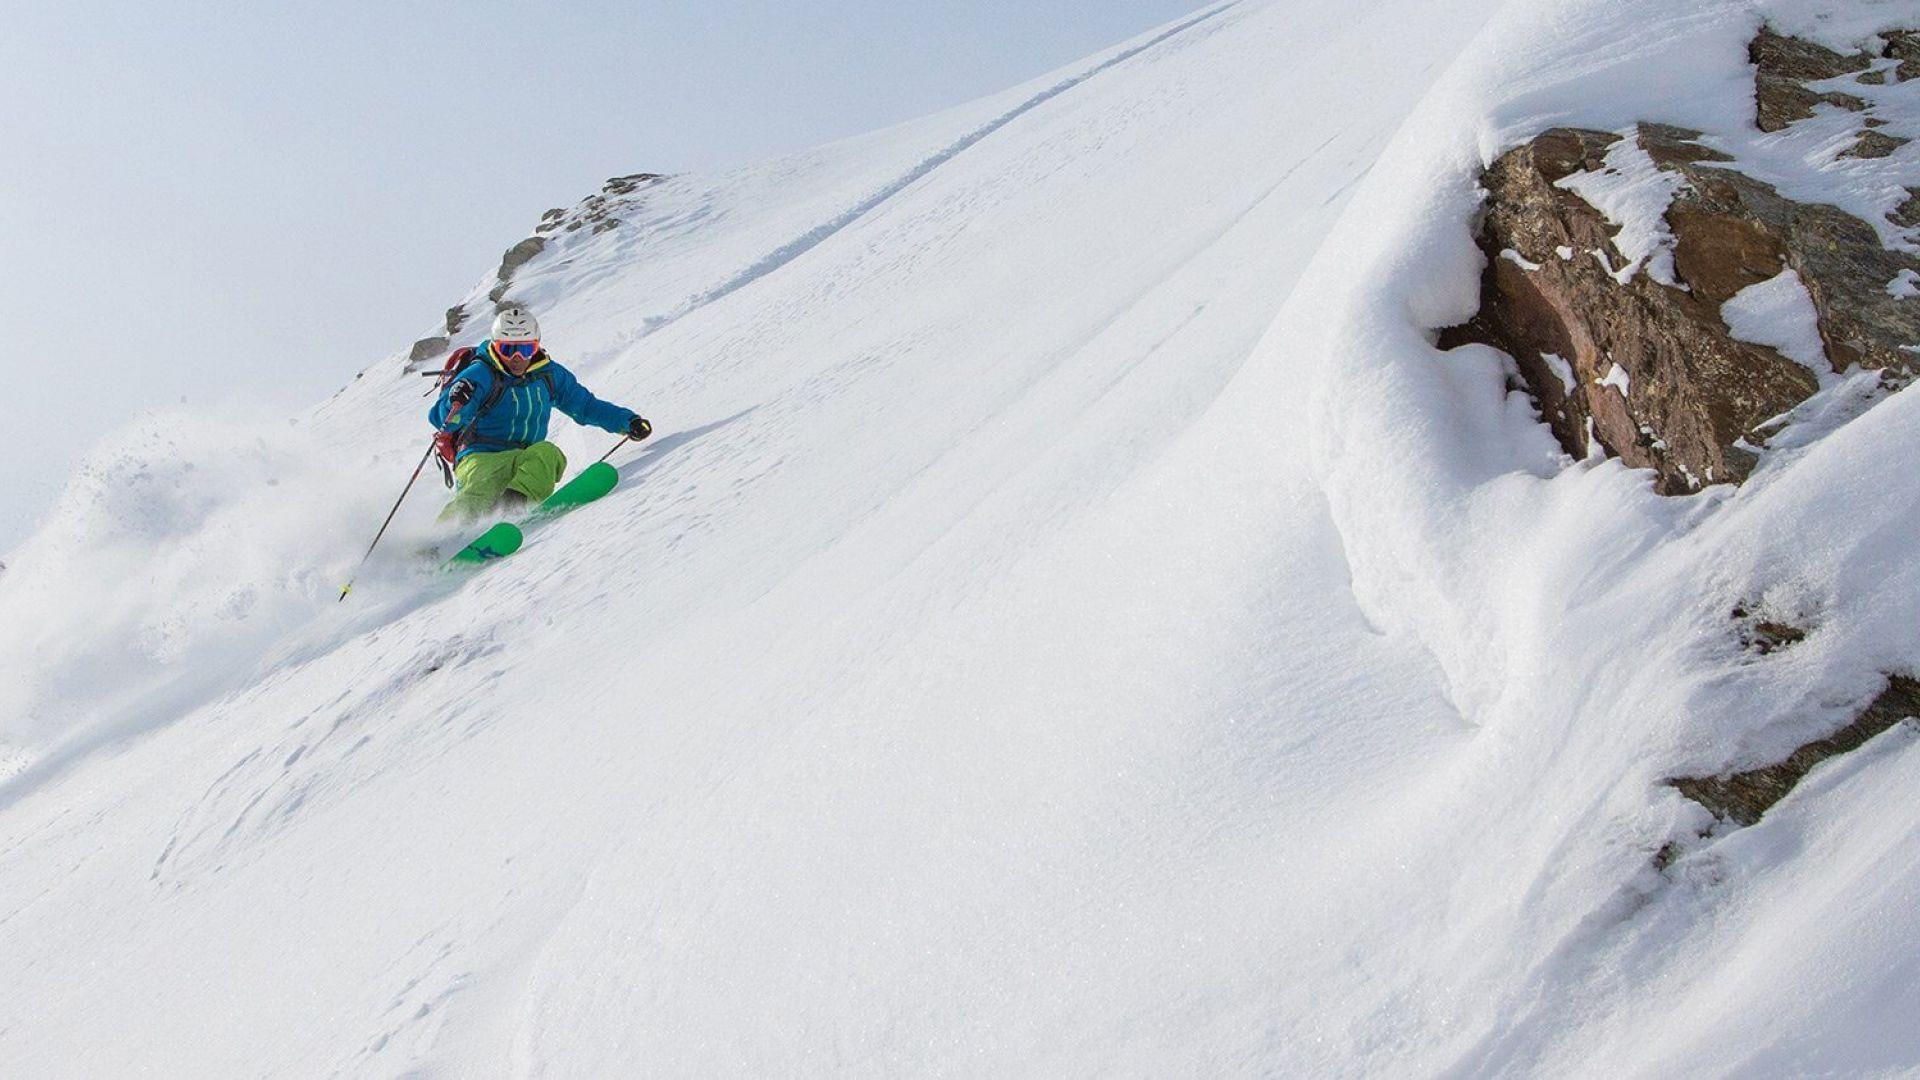 Ski, Italien, Livigno, Gruppenreisen, Reisen, Snowboard, Skikurse, Kinderbetreuung, Winter,